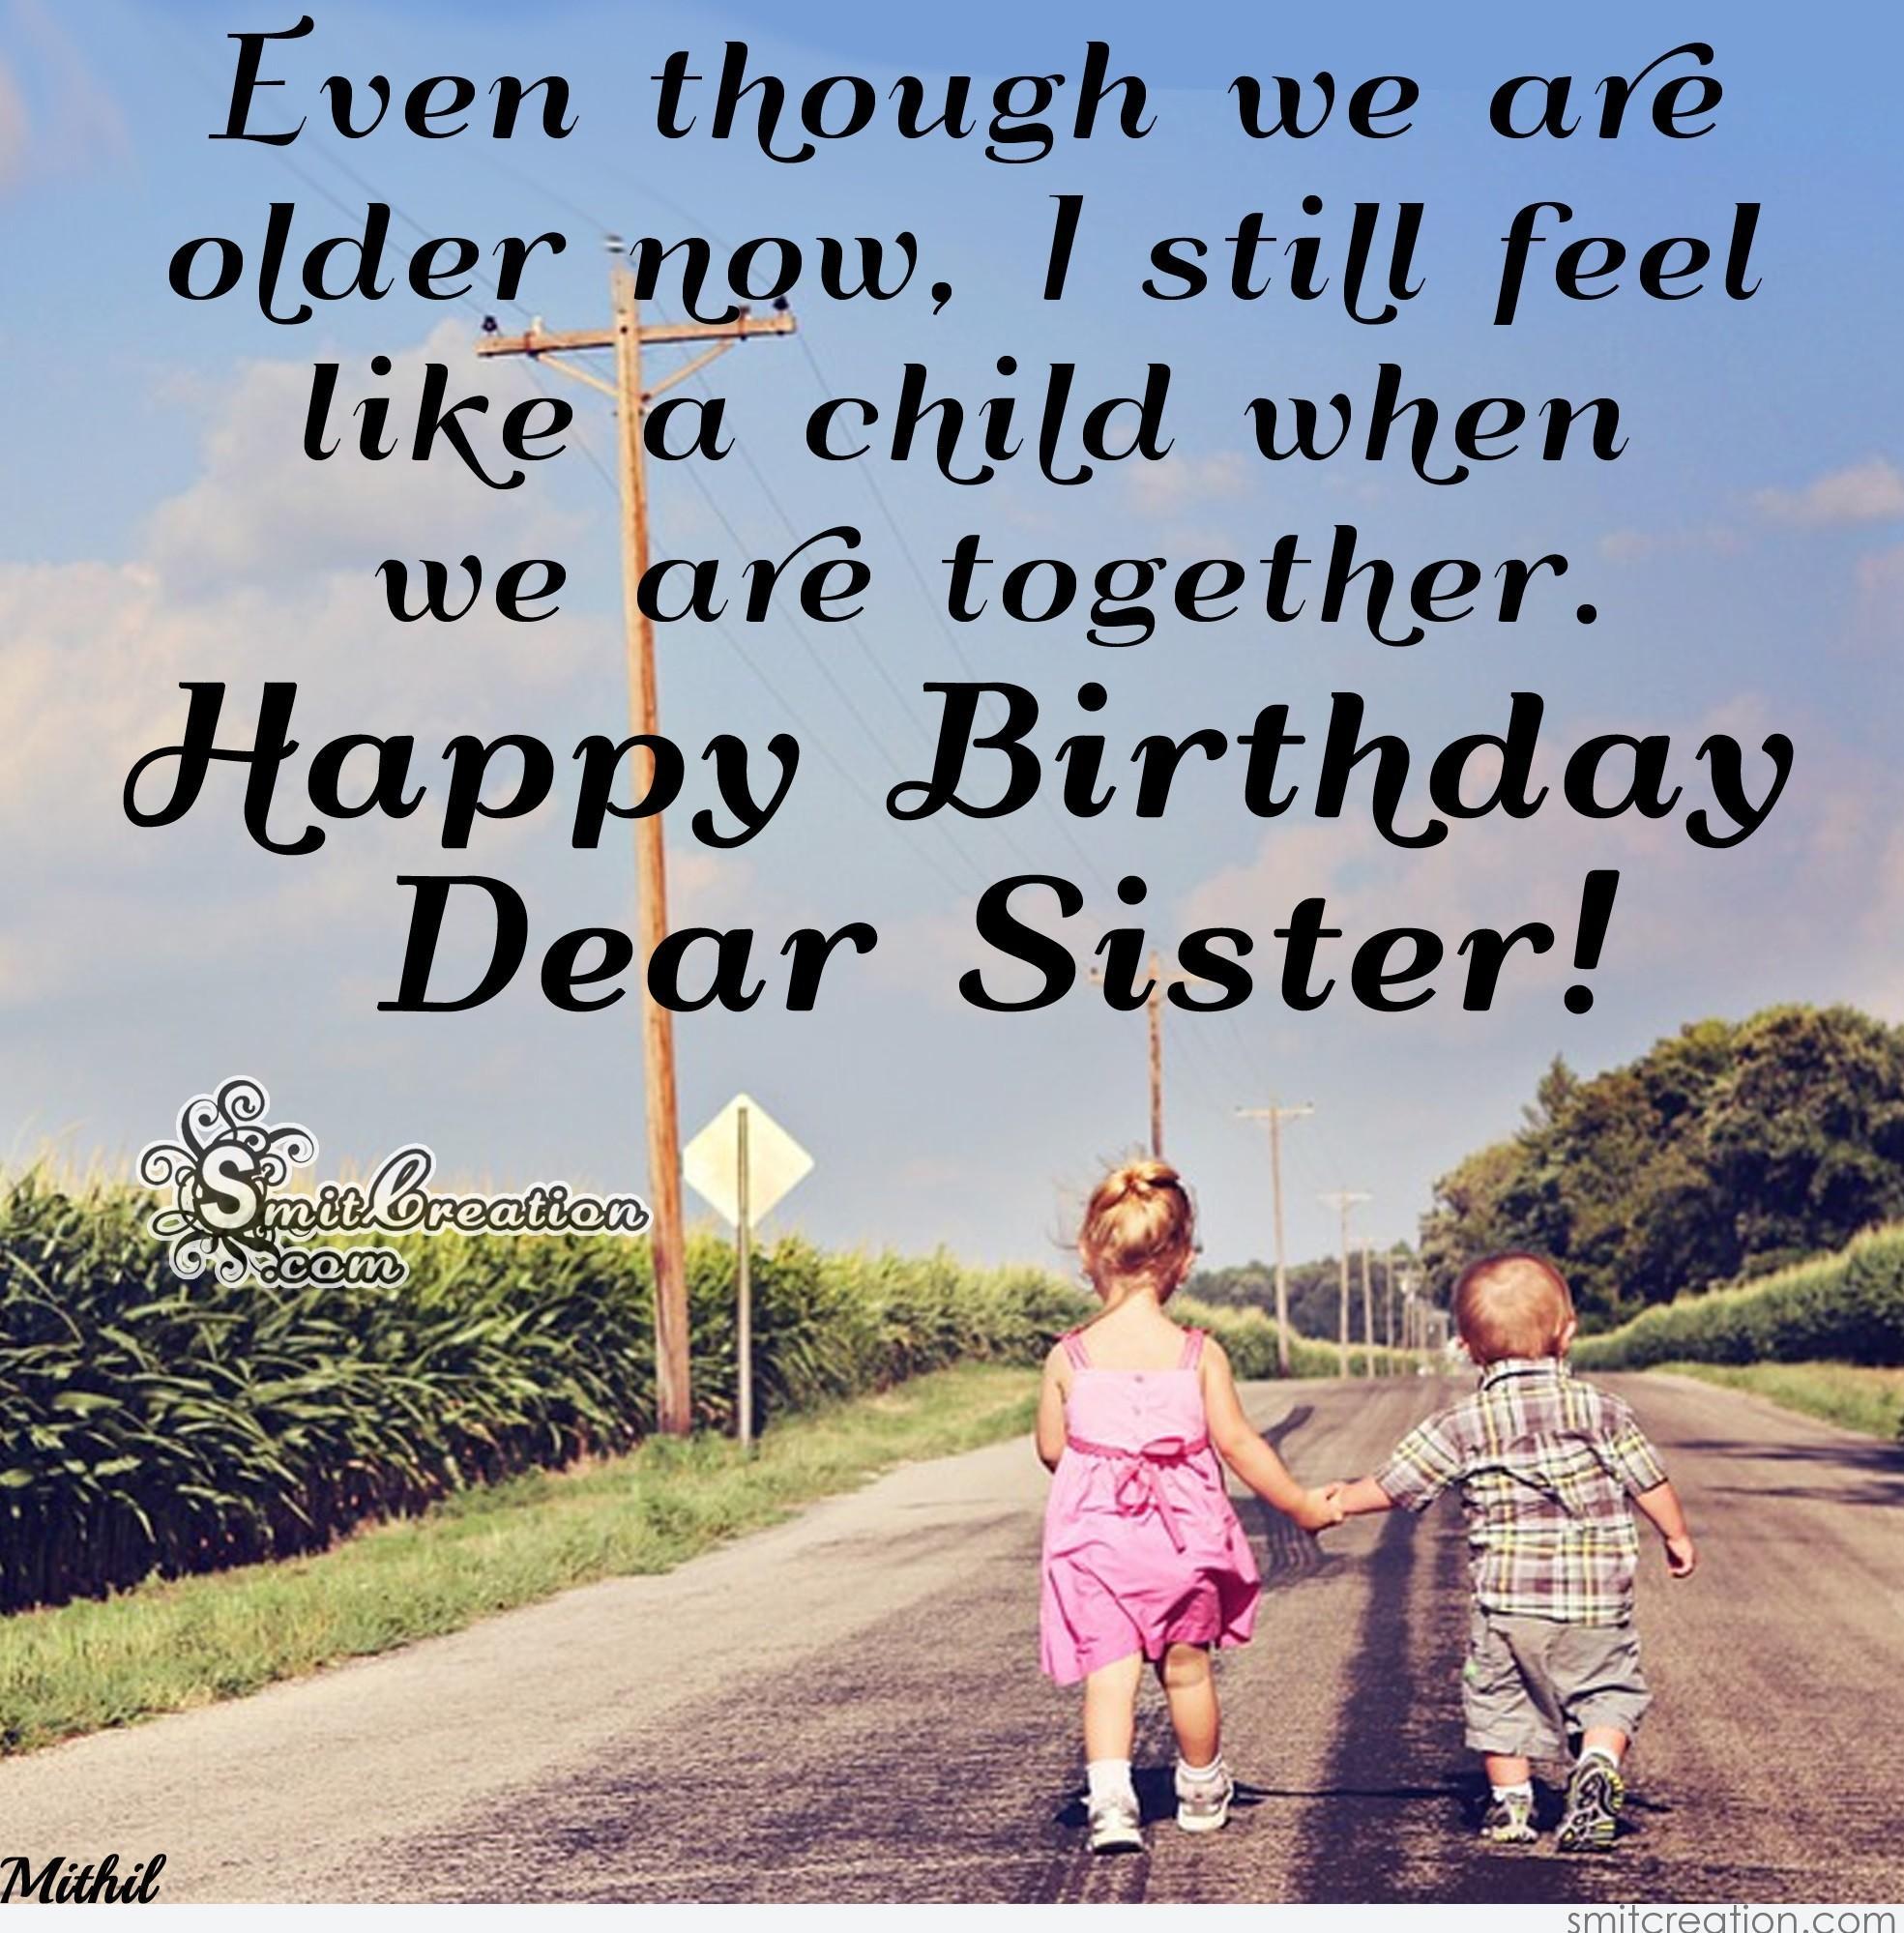 Happy Birthday Dear Sister Smitcreationcom